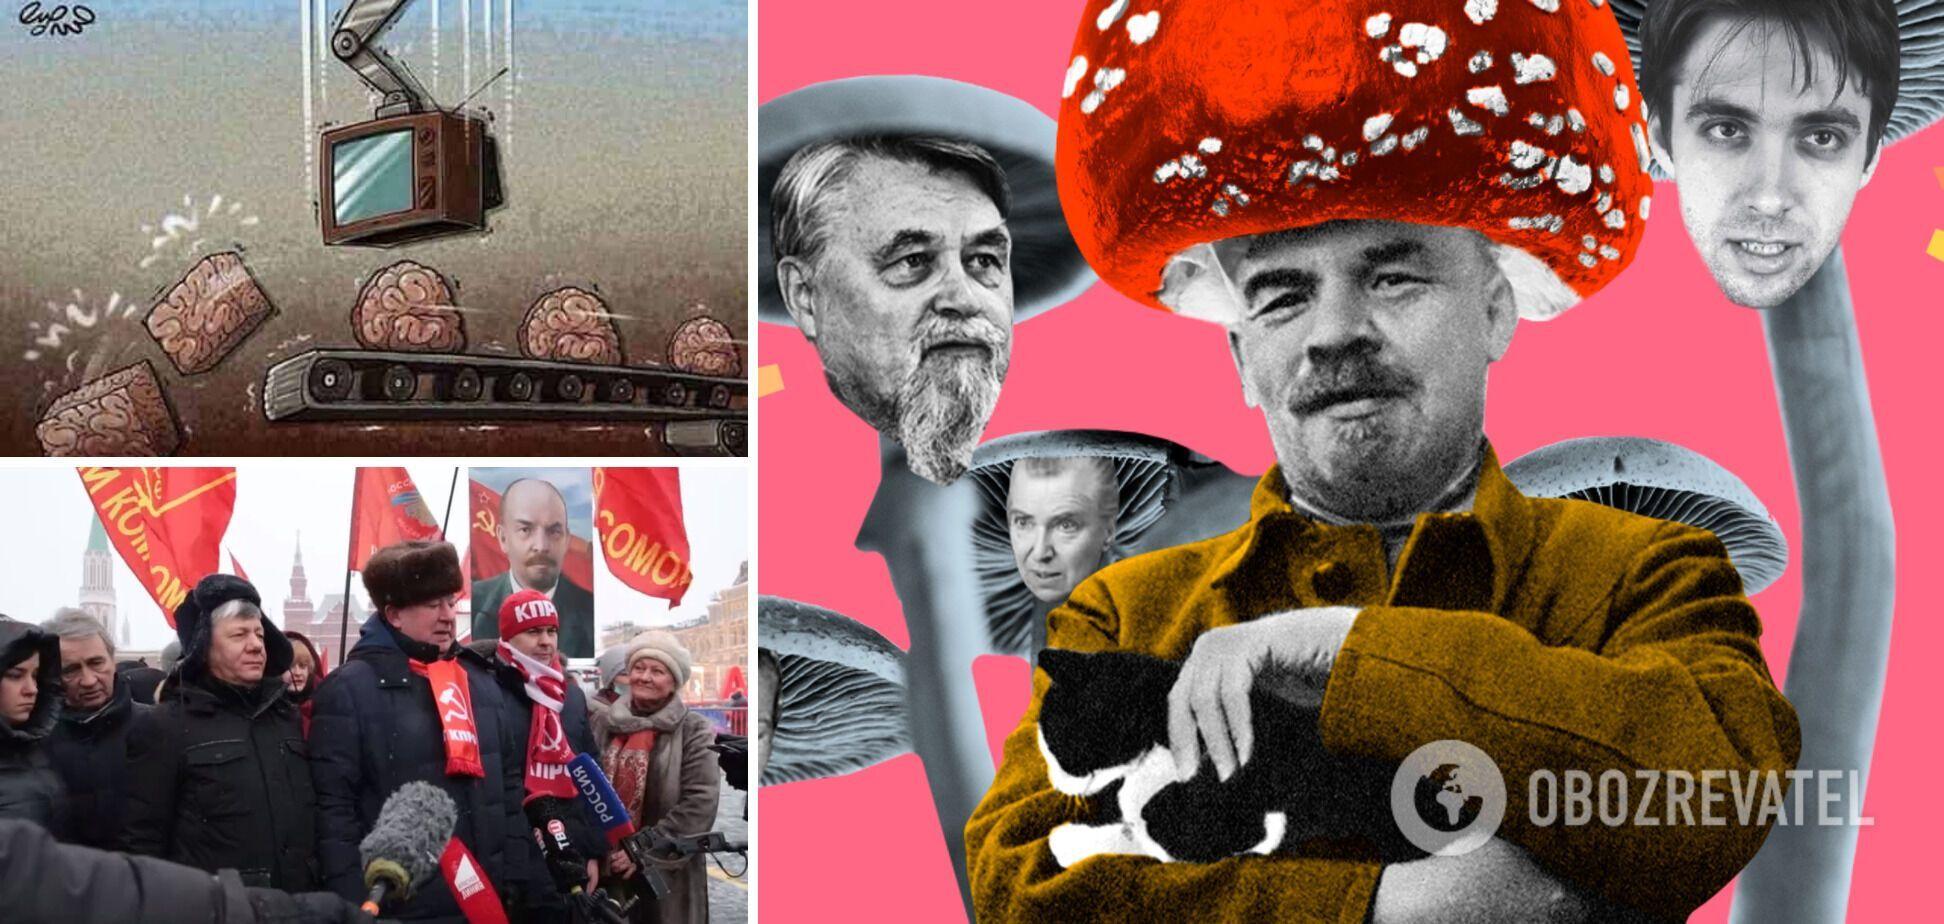 'Ленин-гриб' и советская пропаганда